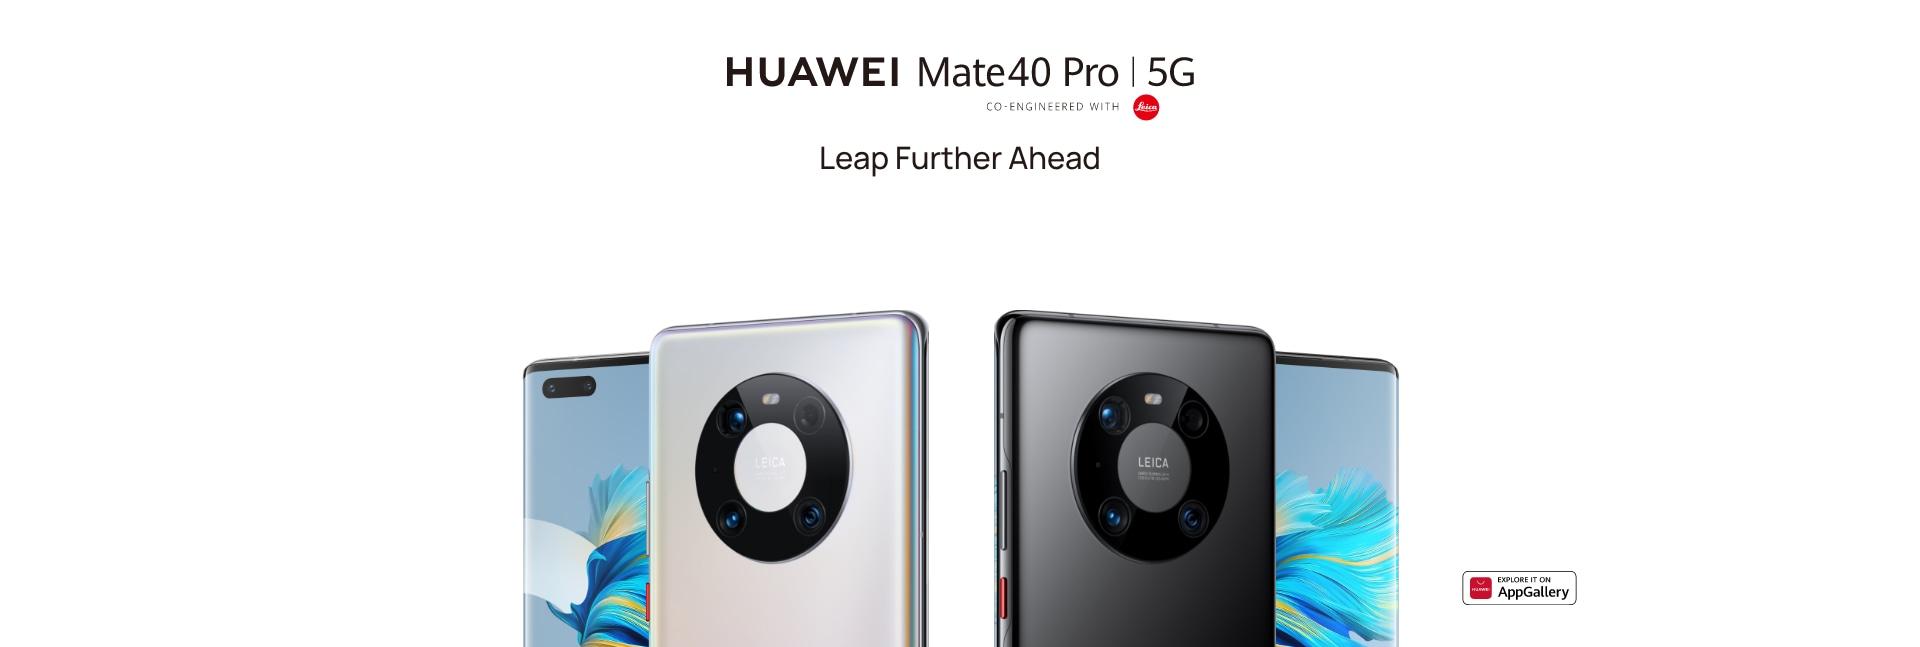 Australia mate40 pro web 1920x647